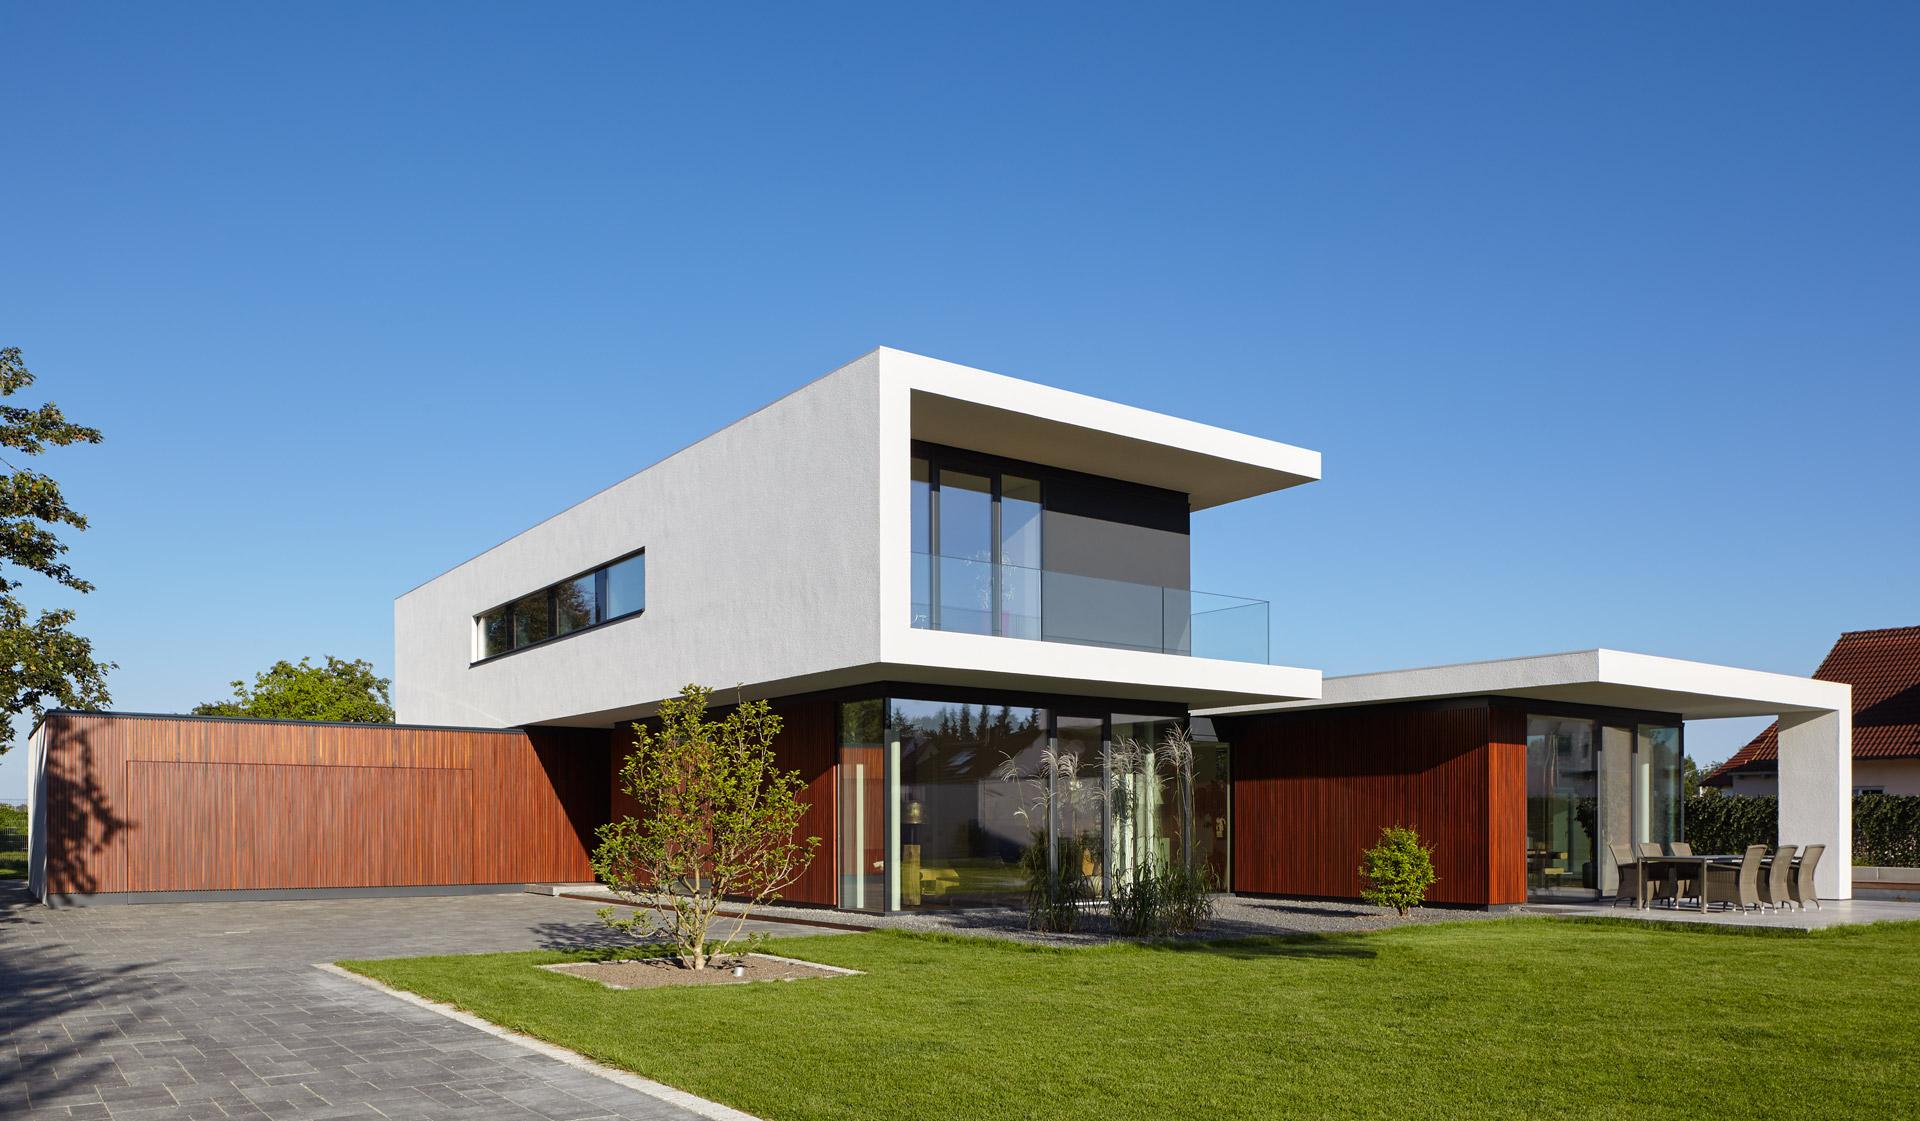 Villa R in Bayern Weber Hummel Architekten 2